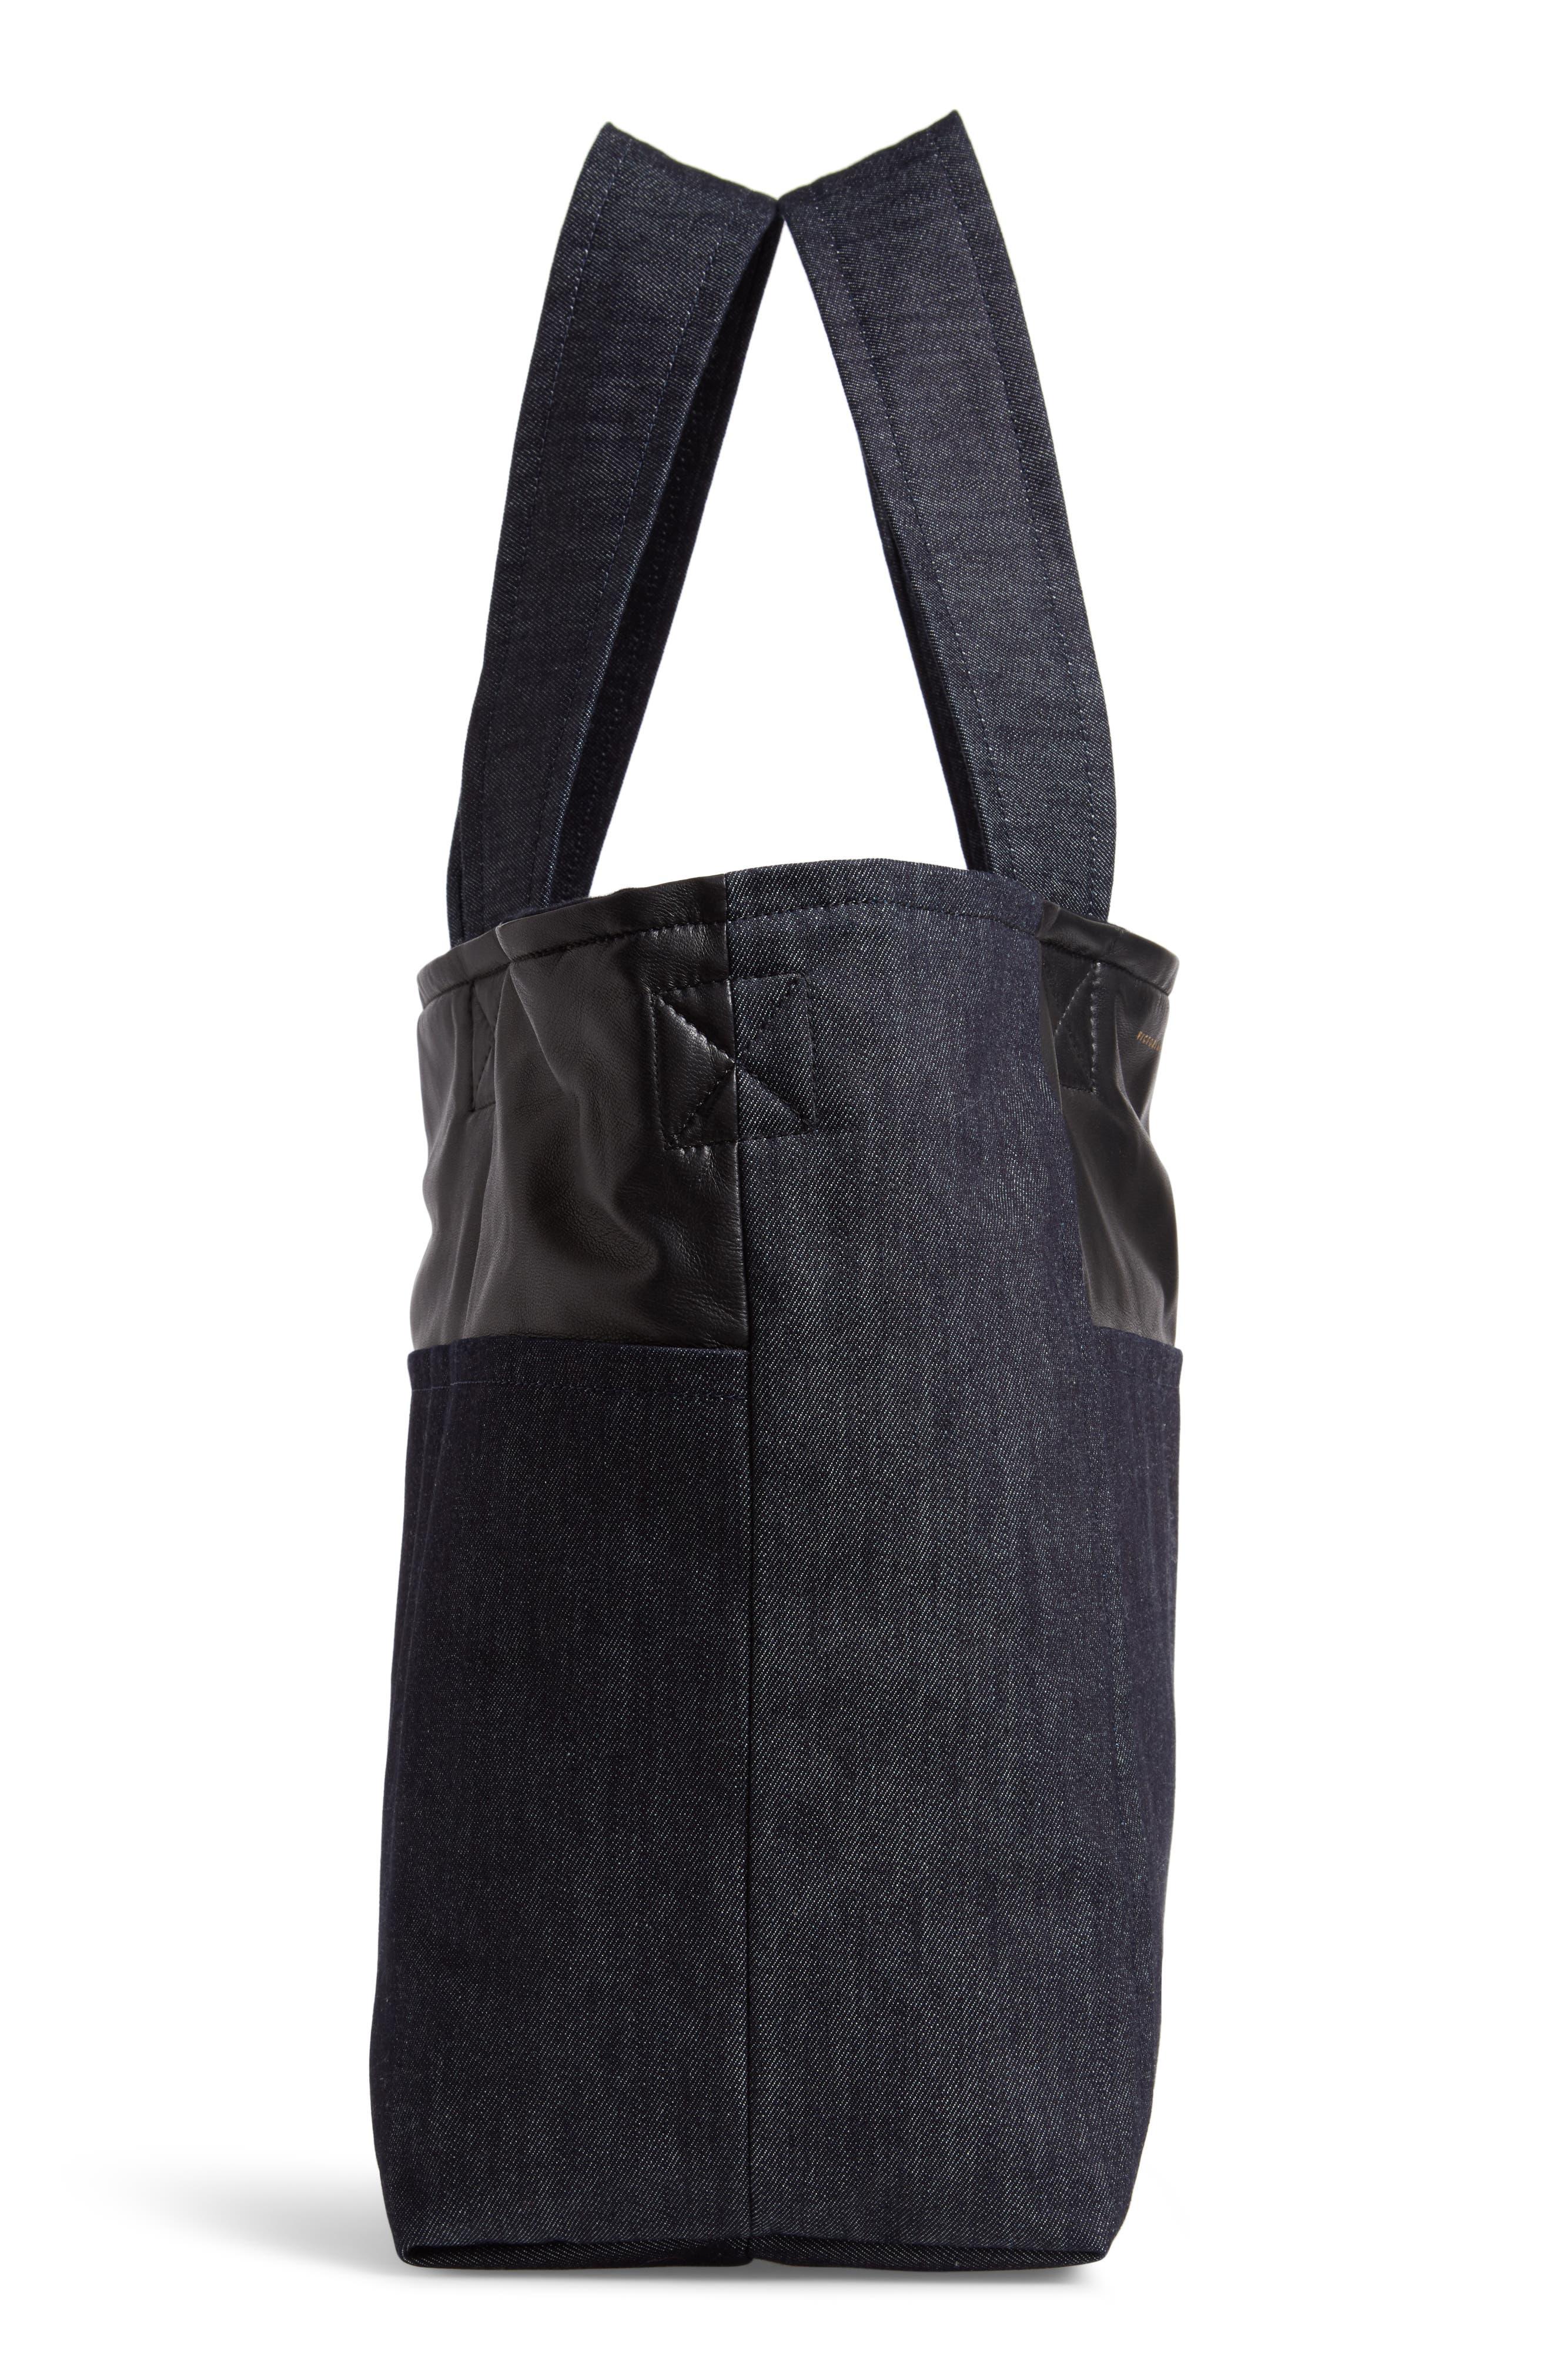 VICTORIA BECKHAM, Sunday Denim & Leather Tote Bag, Alternate thumbnail 5, color, 400